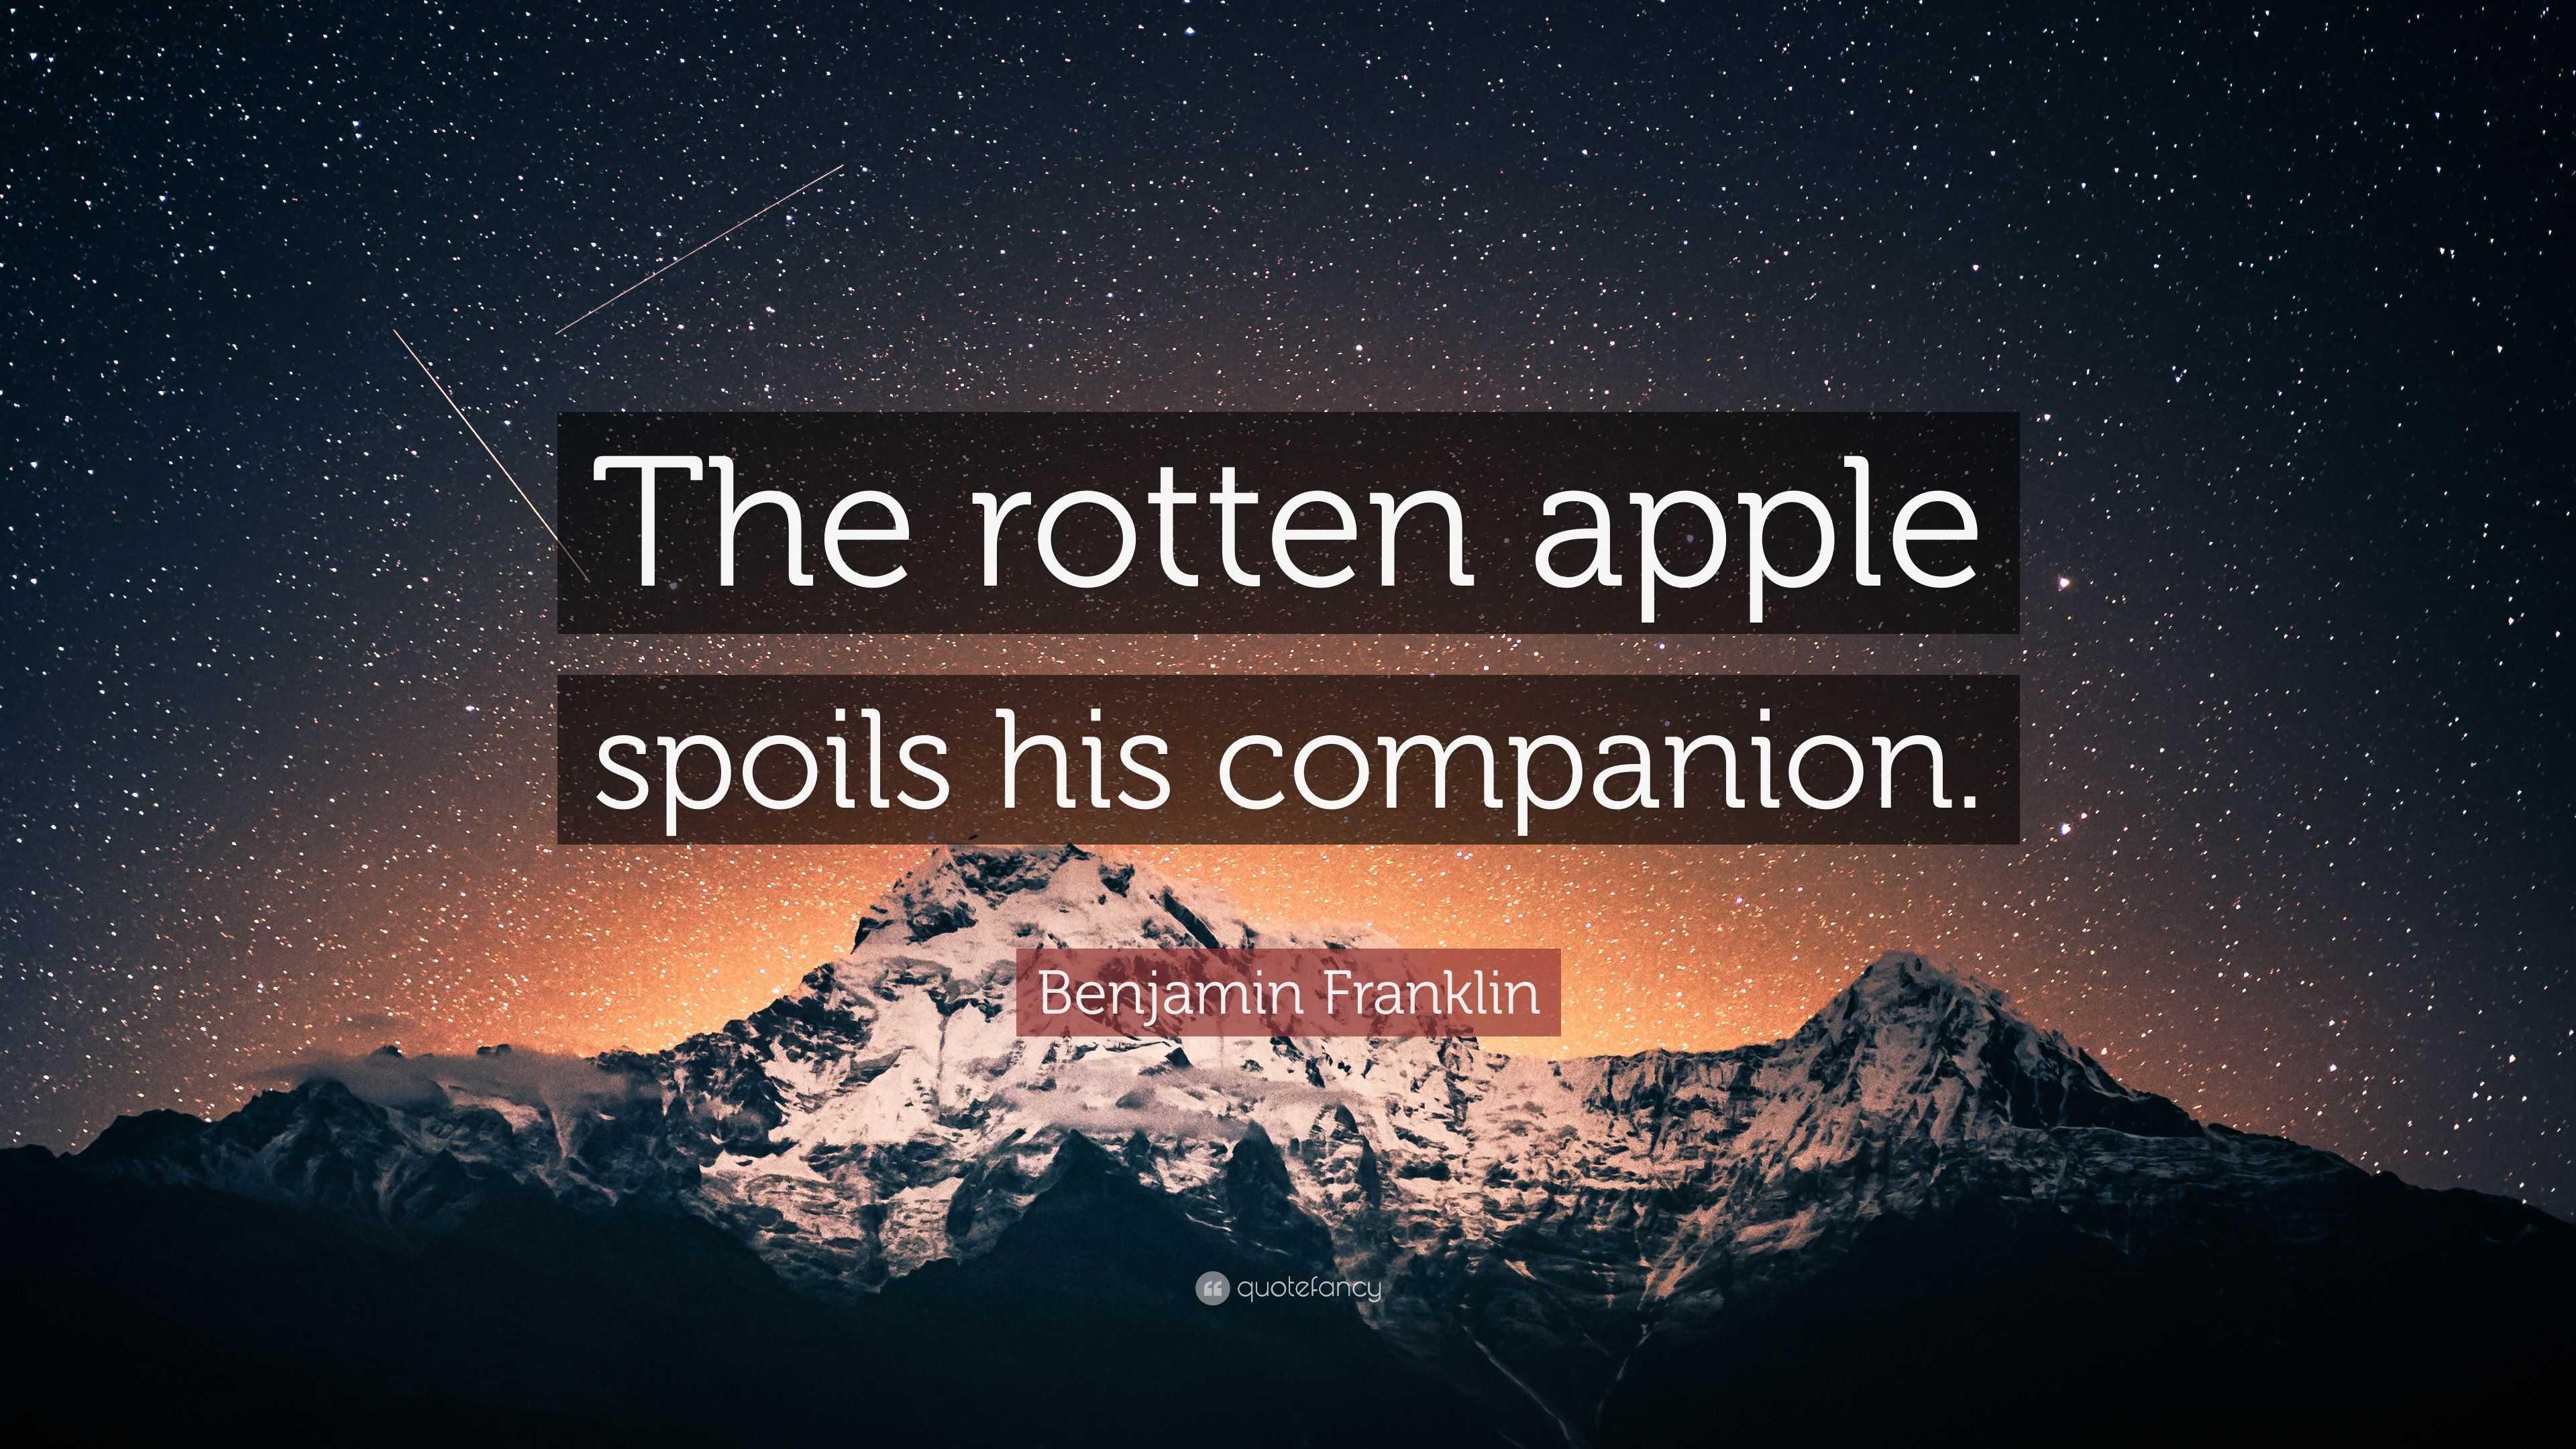 the rotten apple spoils his companions